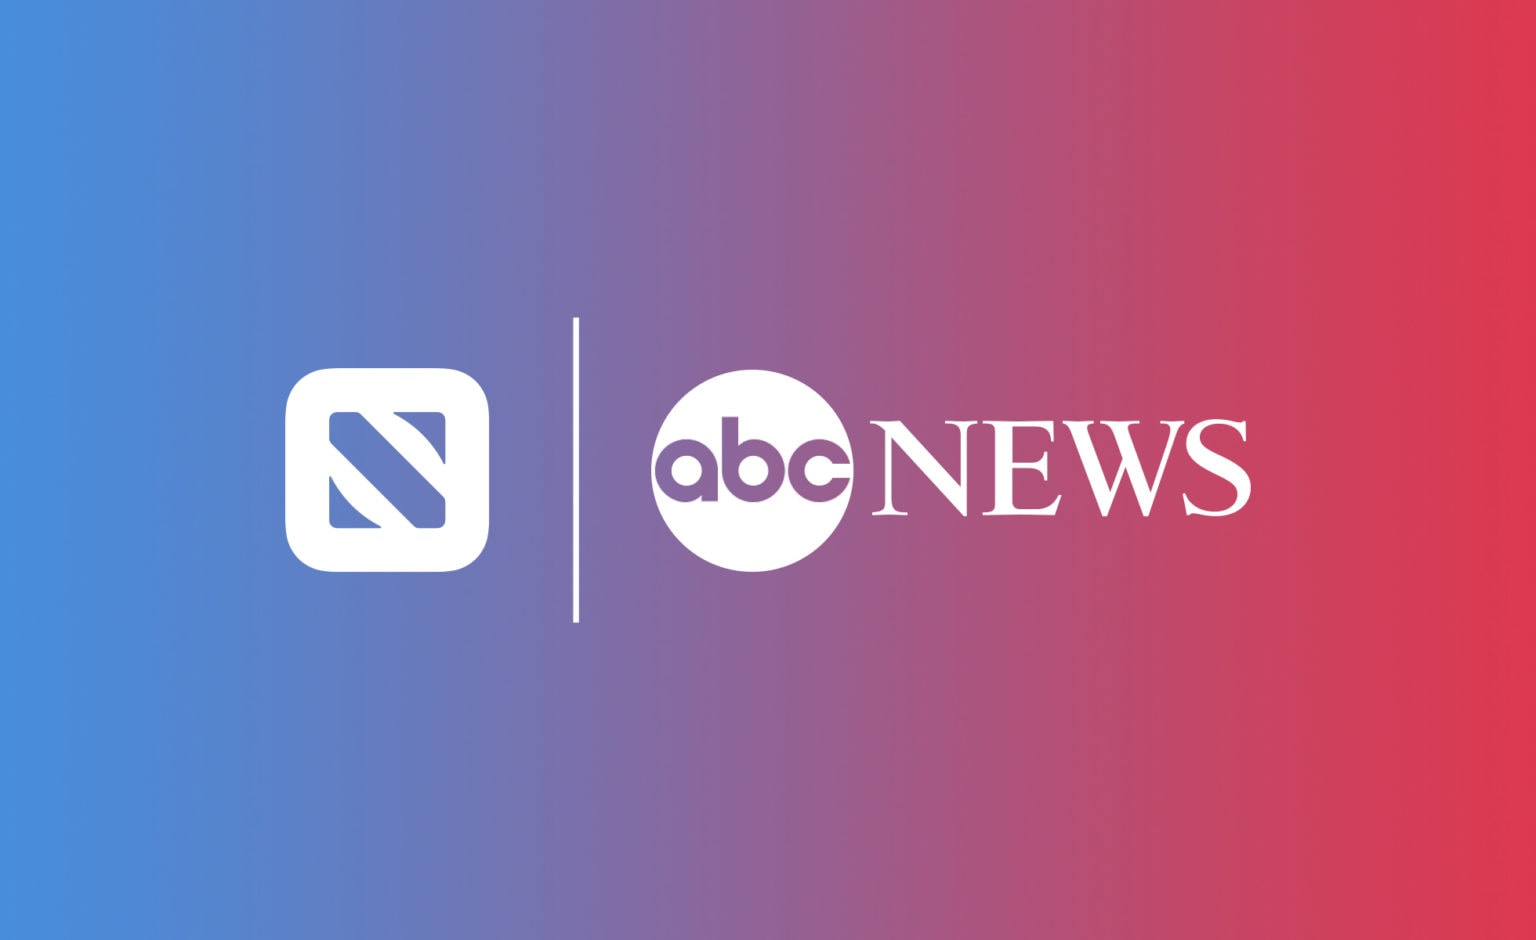 Apple-News-ABC-News